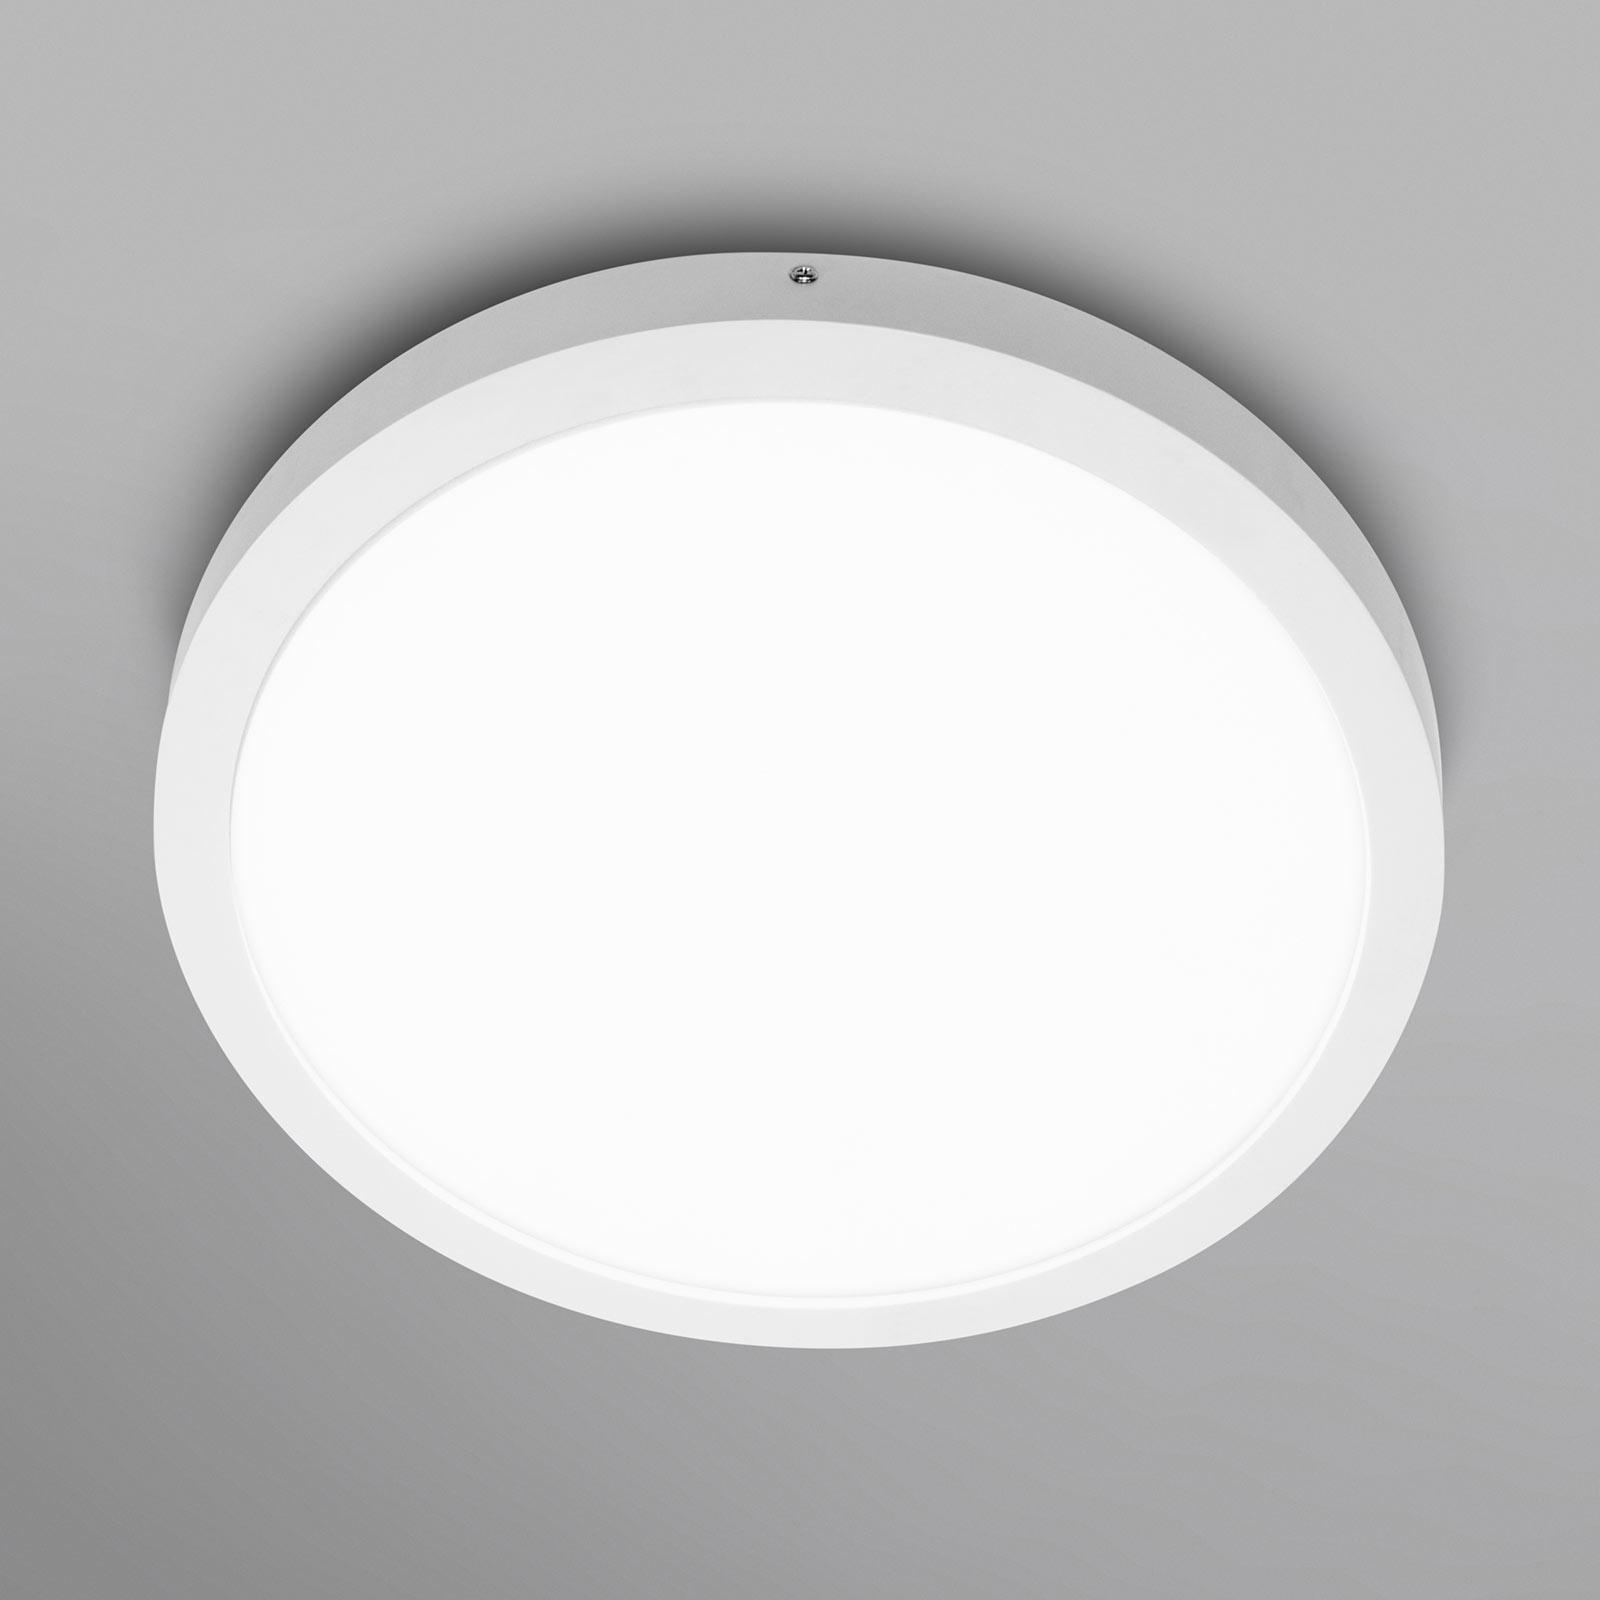 LEDVANCE Planon Round LED-Wandleuchte 40cm 840